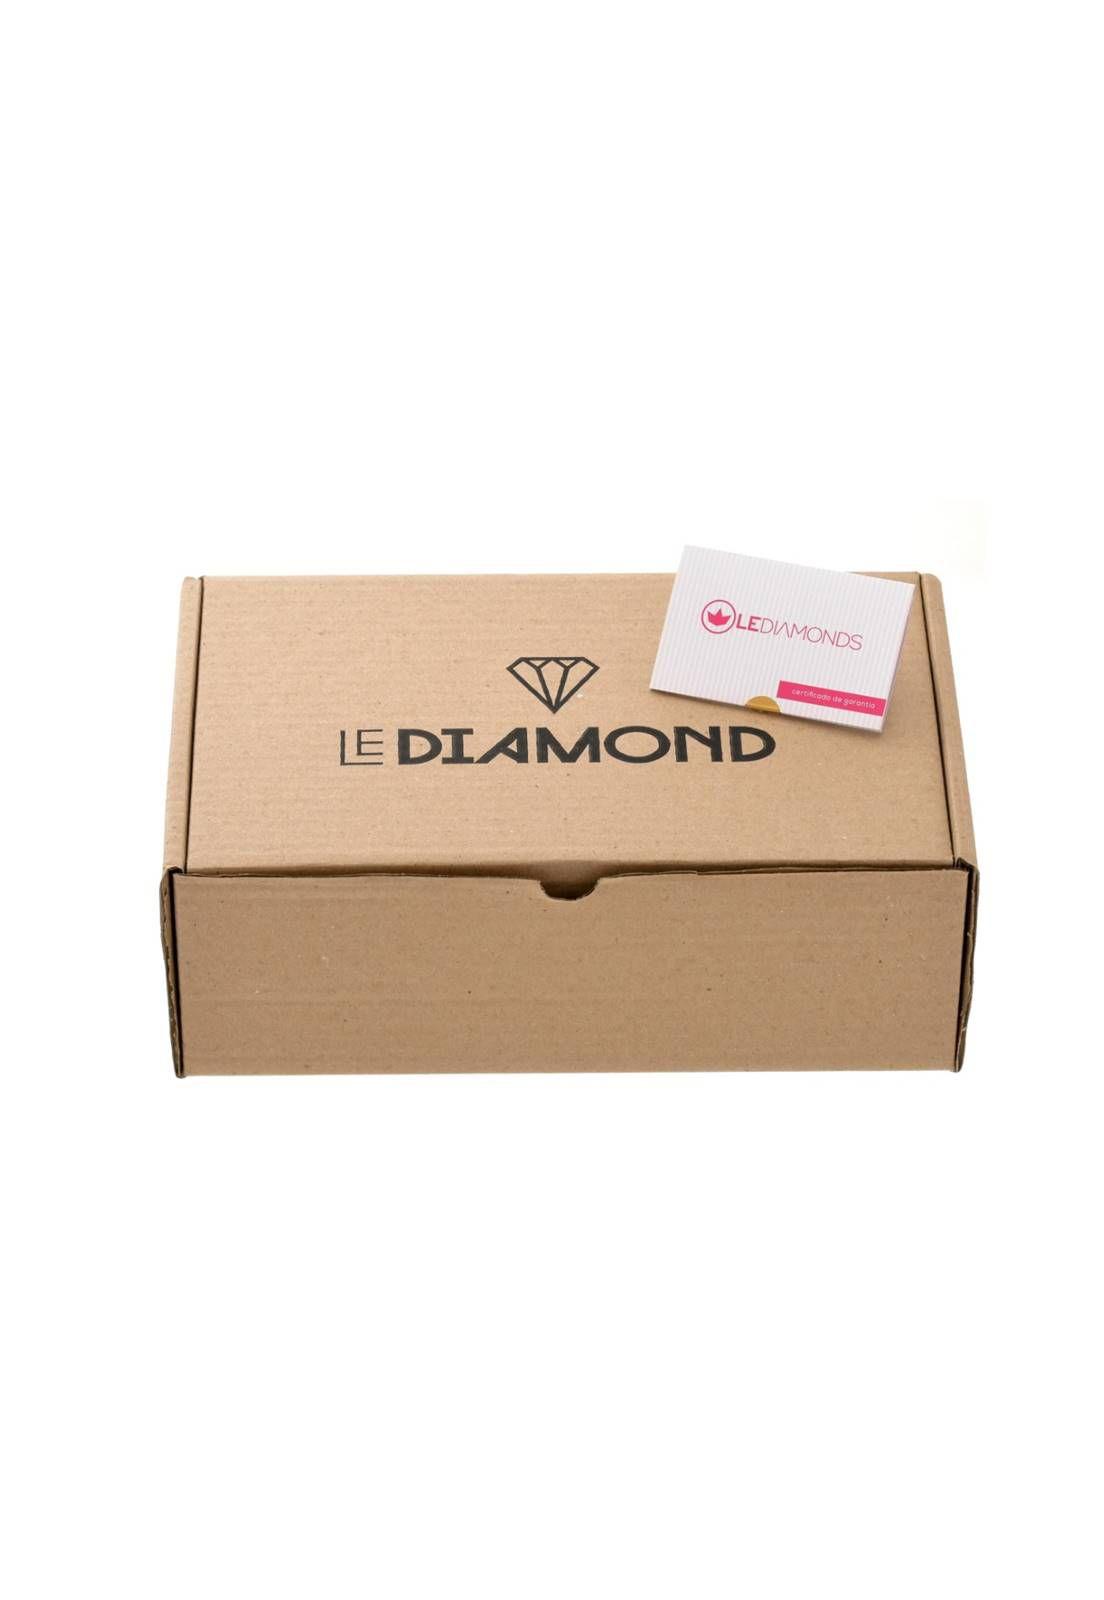 Brinco Le Diamond Carminha Crochê Rosa Velho Escuro